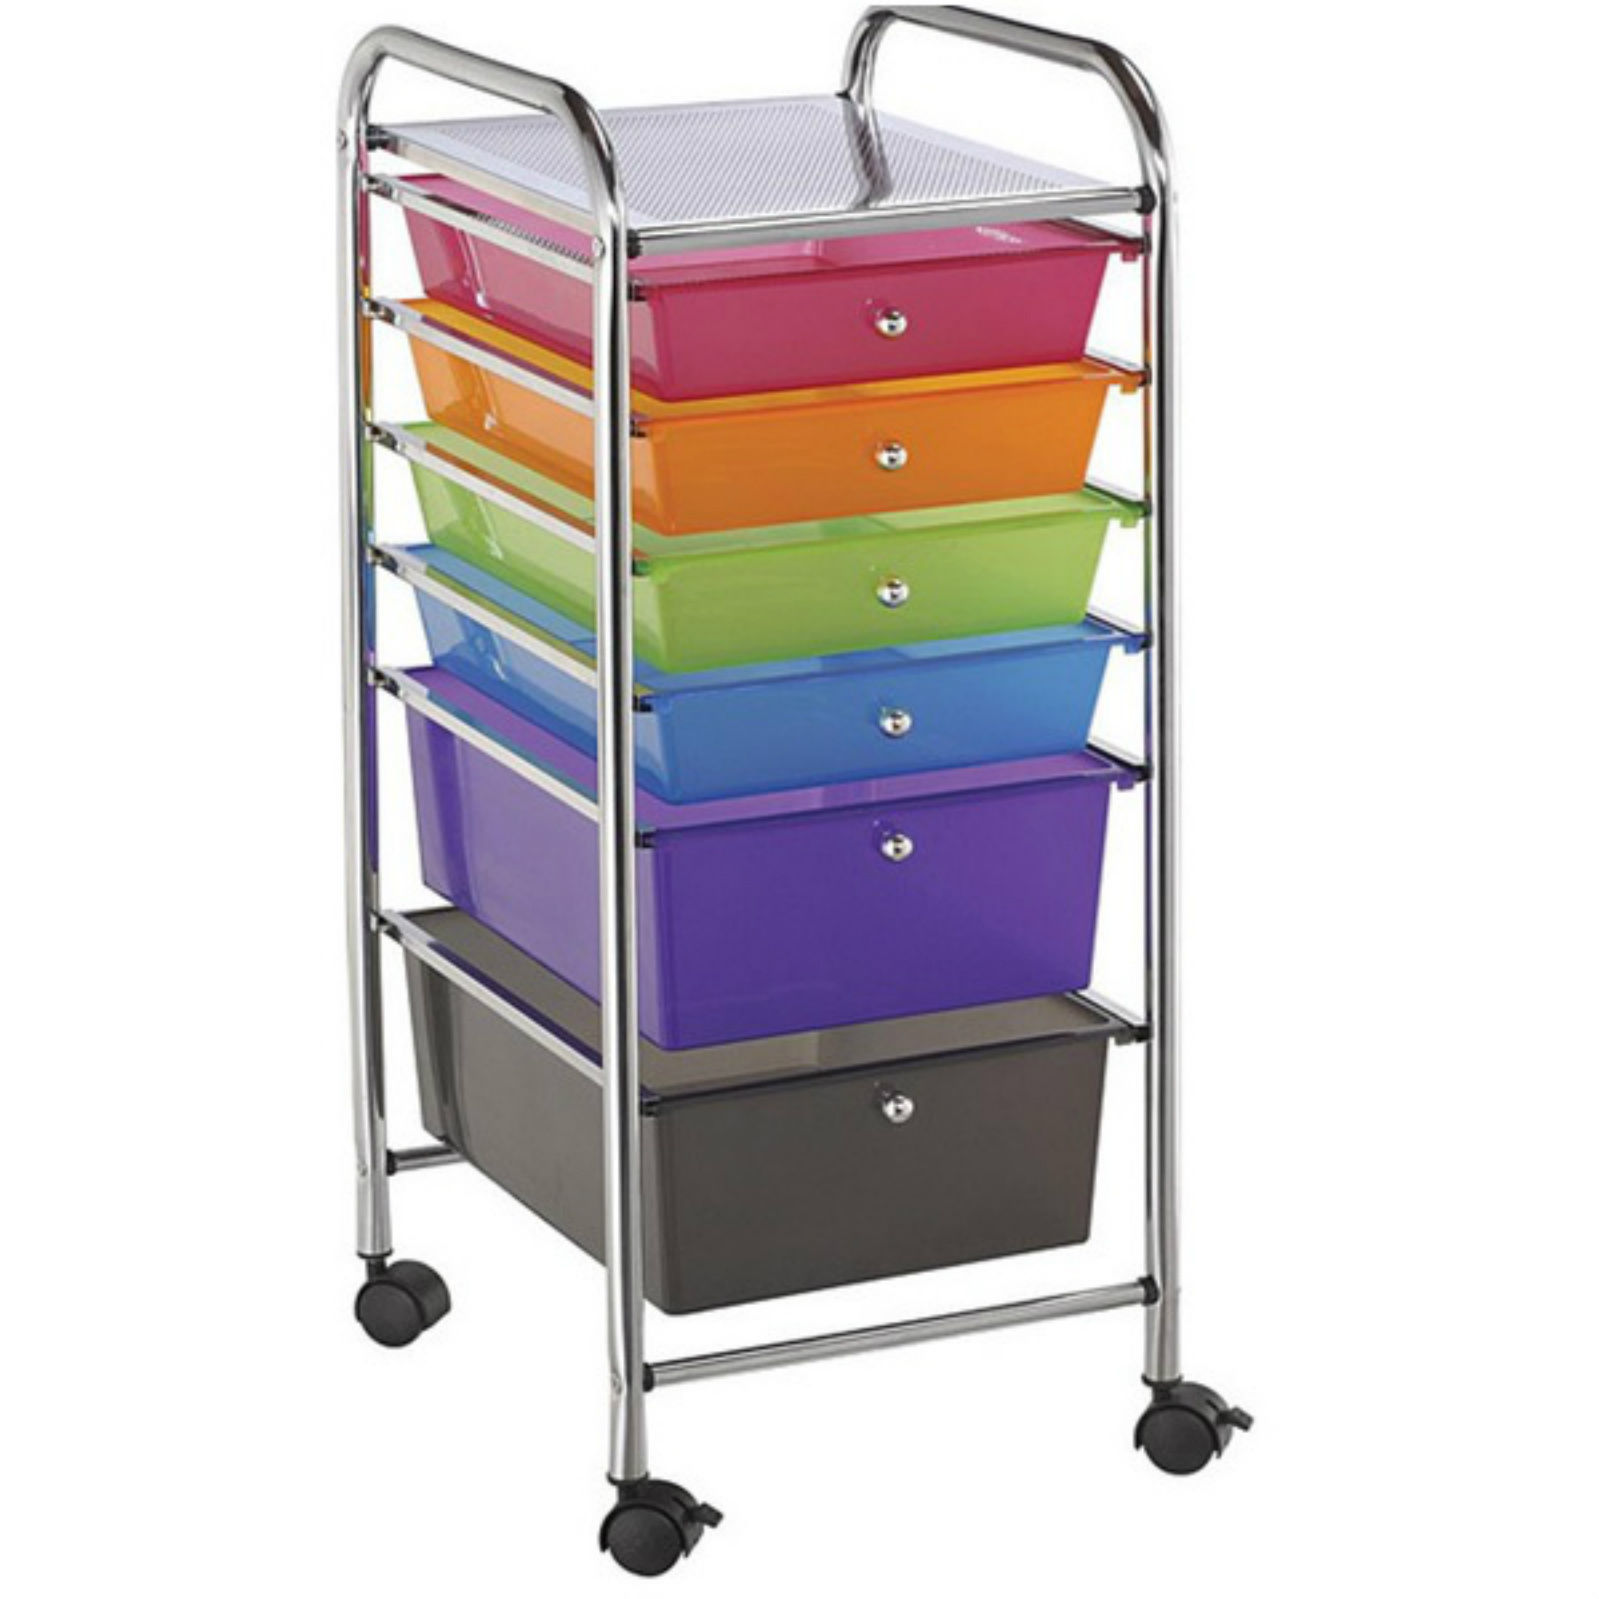 6 drawer organizer rolling storage cart supplies office school plastic cabinet scrapbook hobby. Black Bedroom Furniture Sets. Home Design Ideas